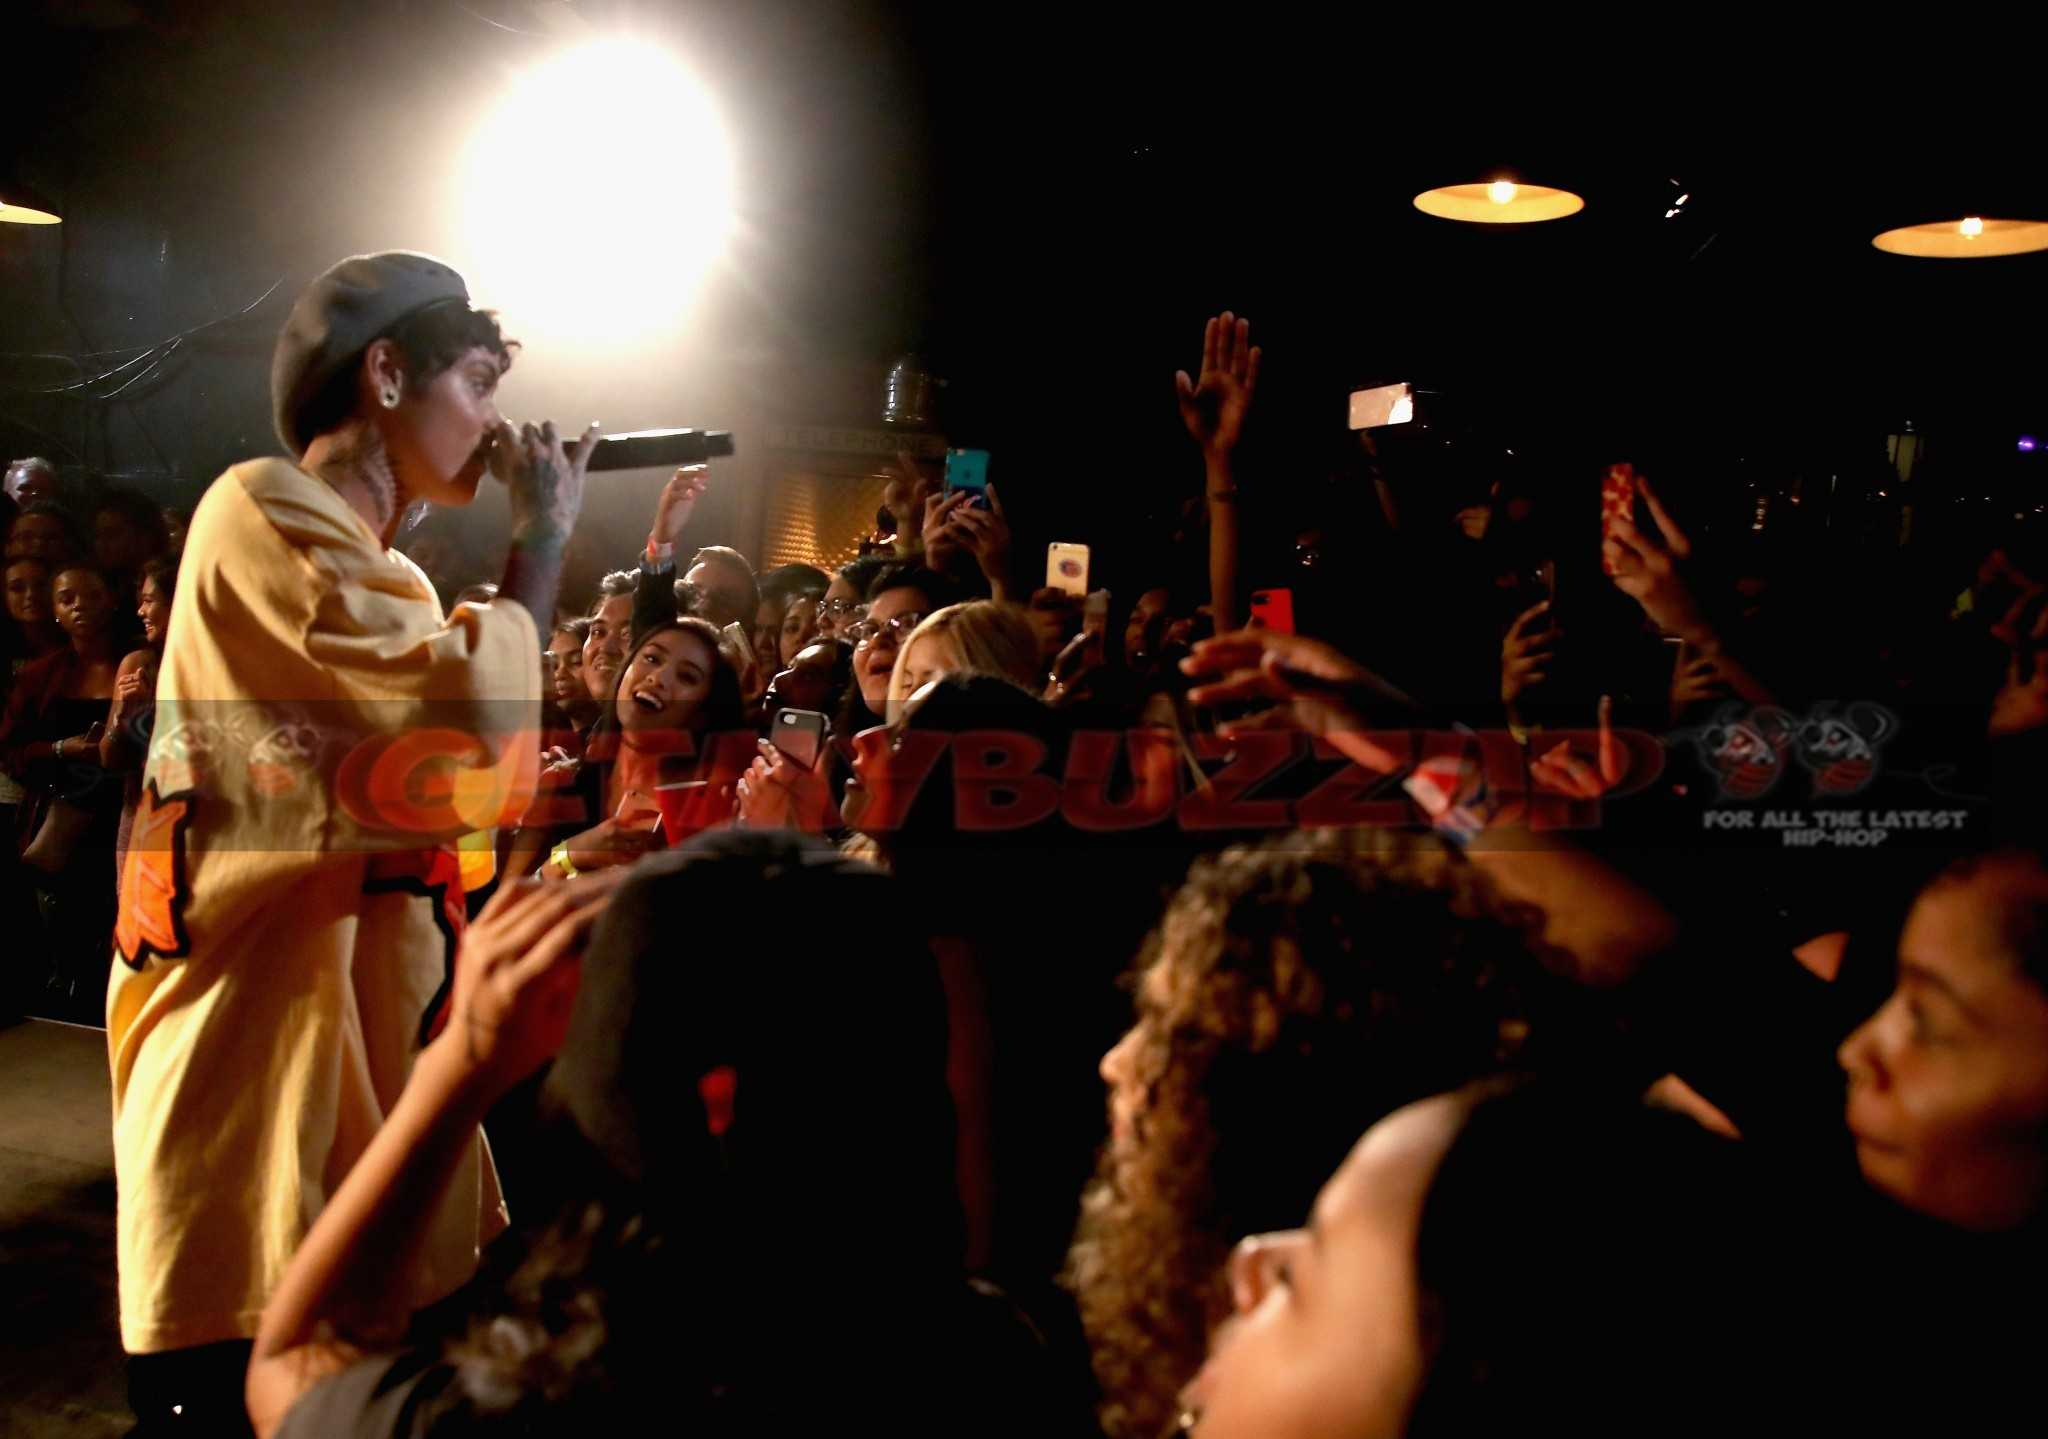 Watch: Kehlani Performing Live on Mtv's 'Wonderland' [Video + Photos]